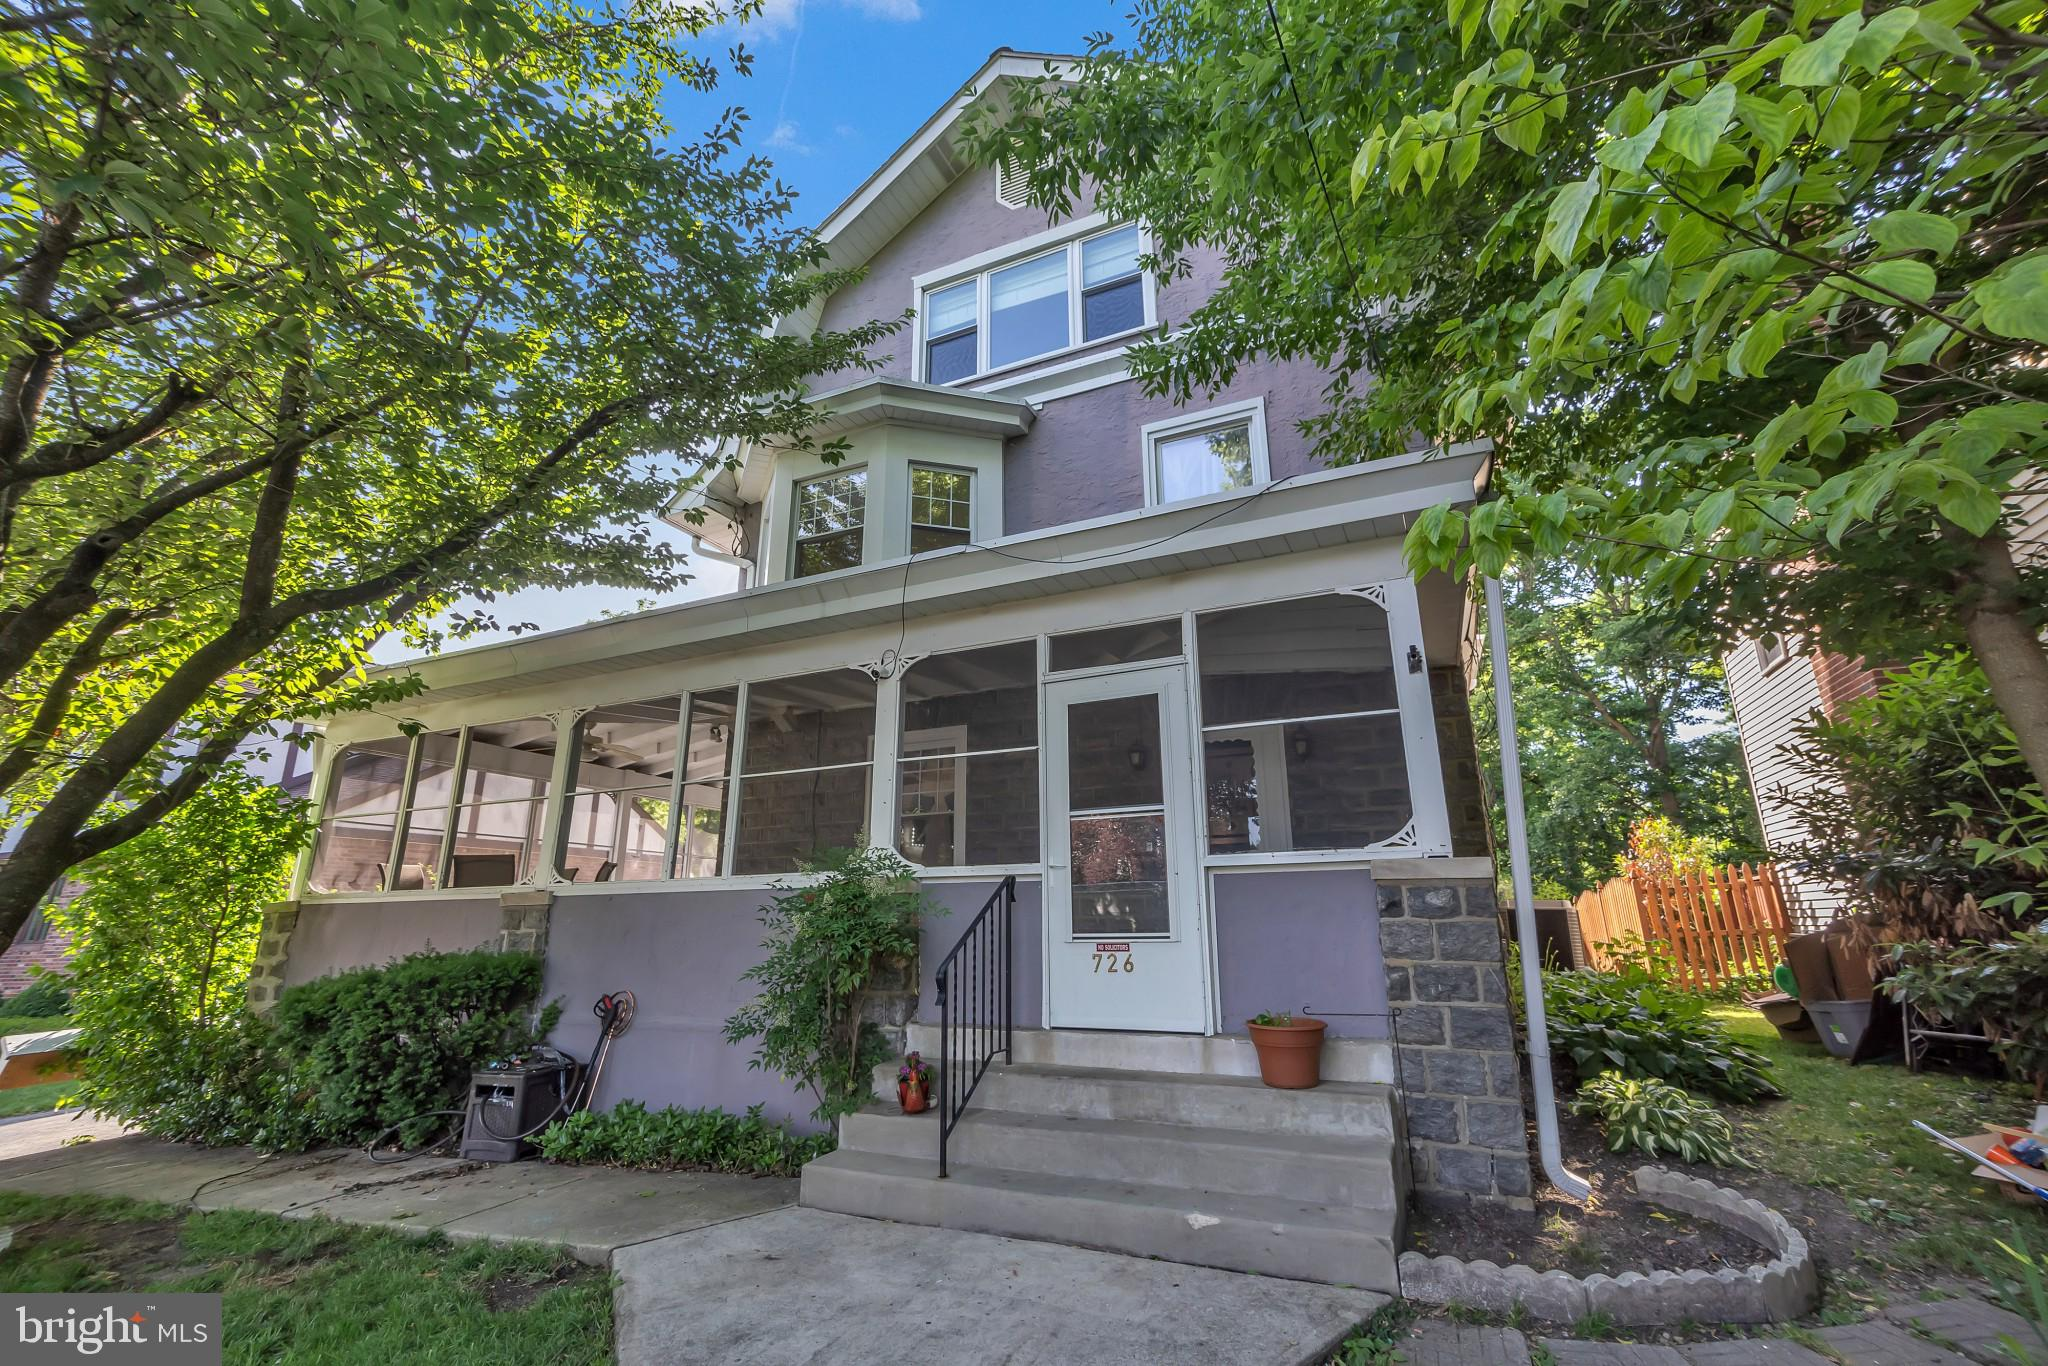 726 Homestead Avenue, Havertown, PA 19083